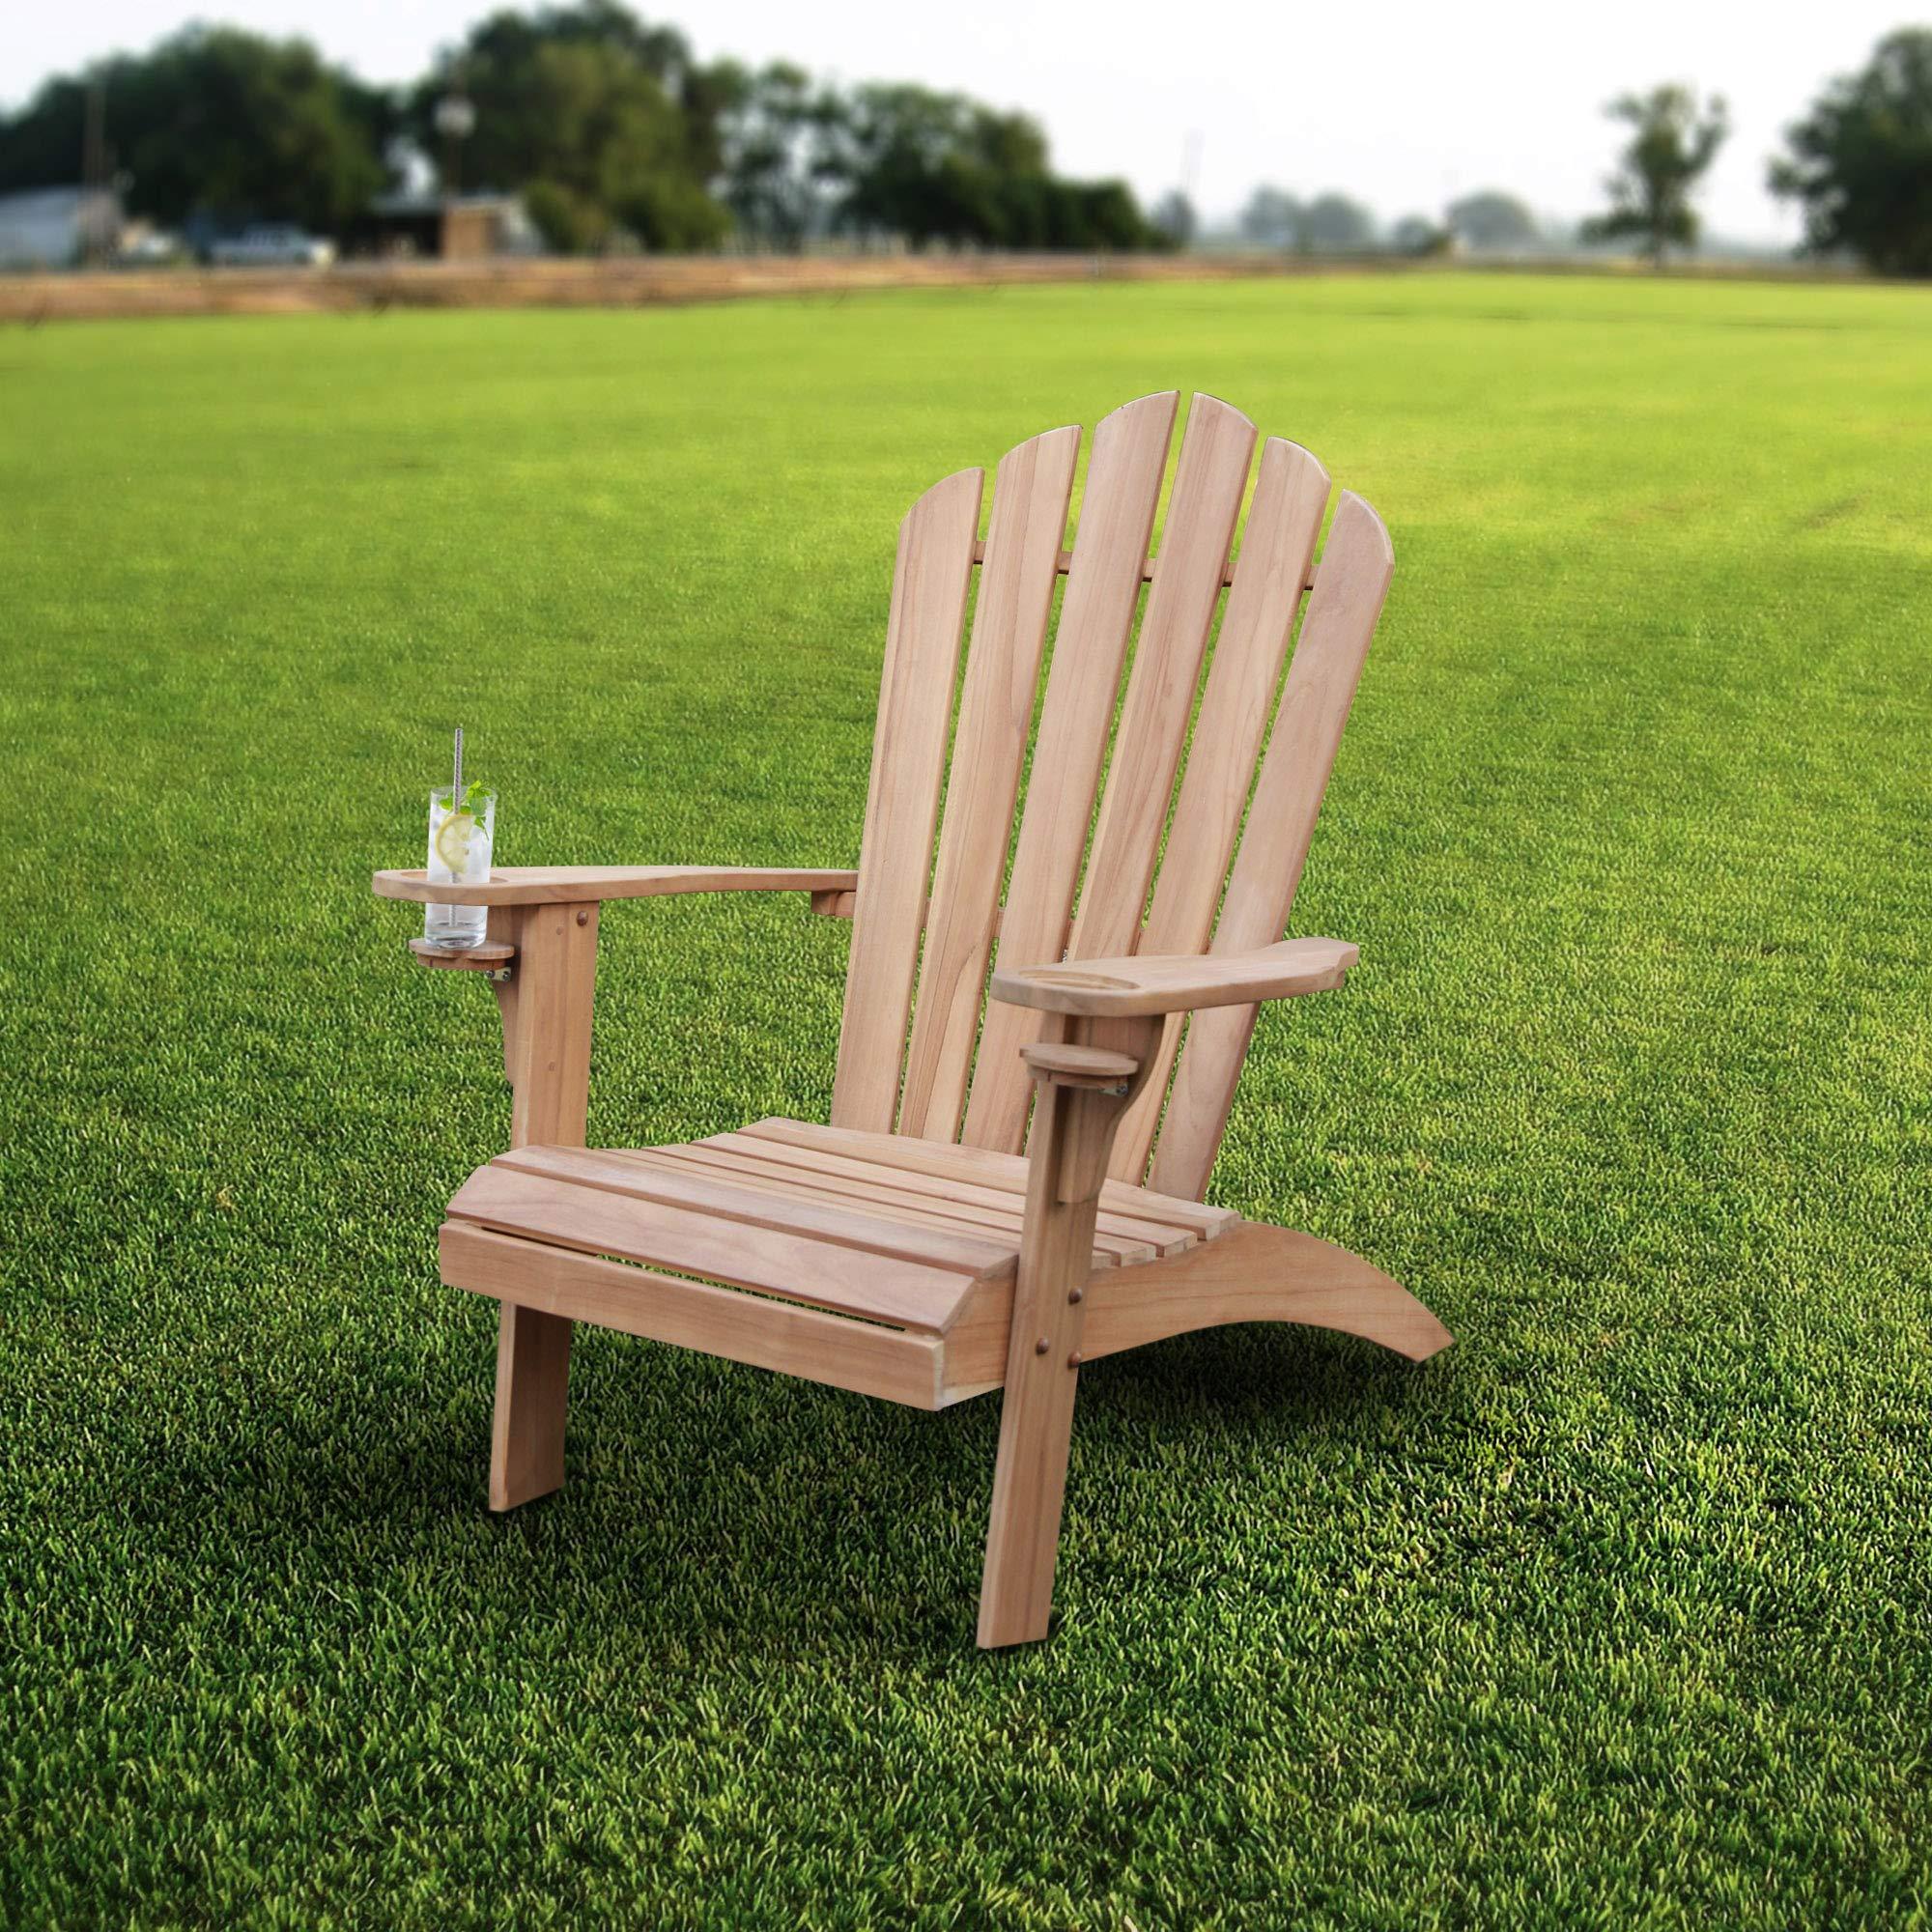 Cambridge-Casual AMZ-240309T Arie Adirondack Chair, Teak